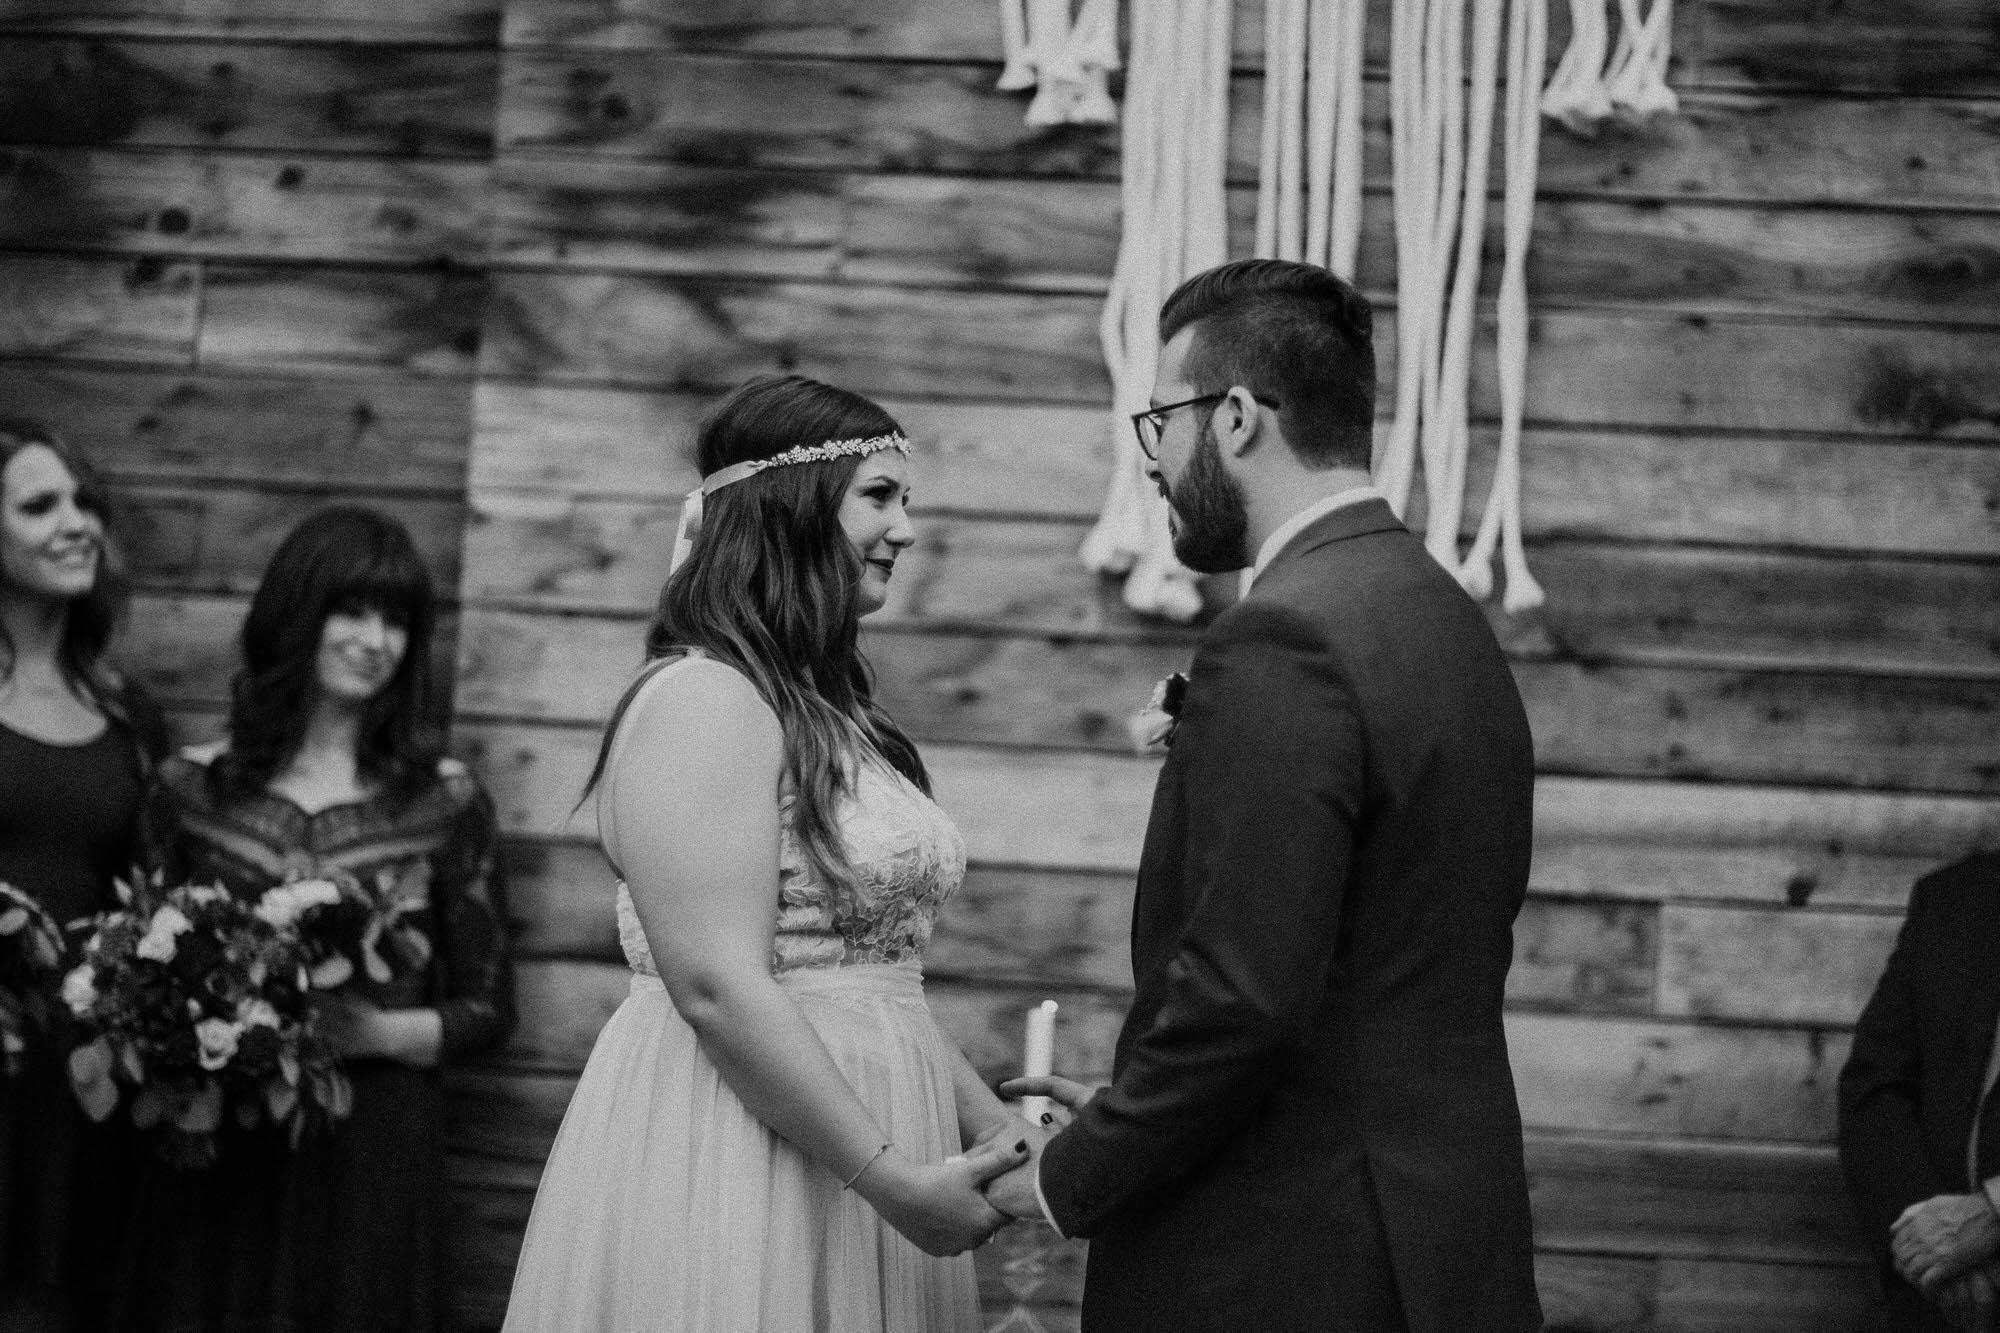 los-angeles-wedding-photographer-kristen-dylan-63.jpg